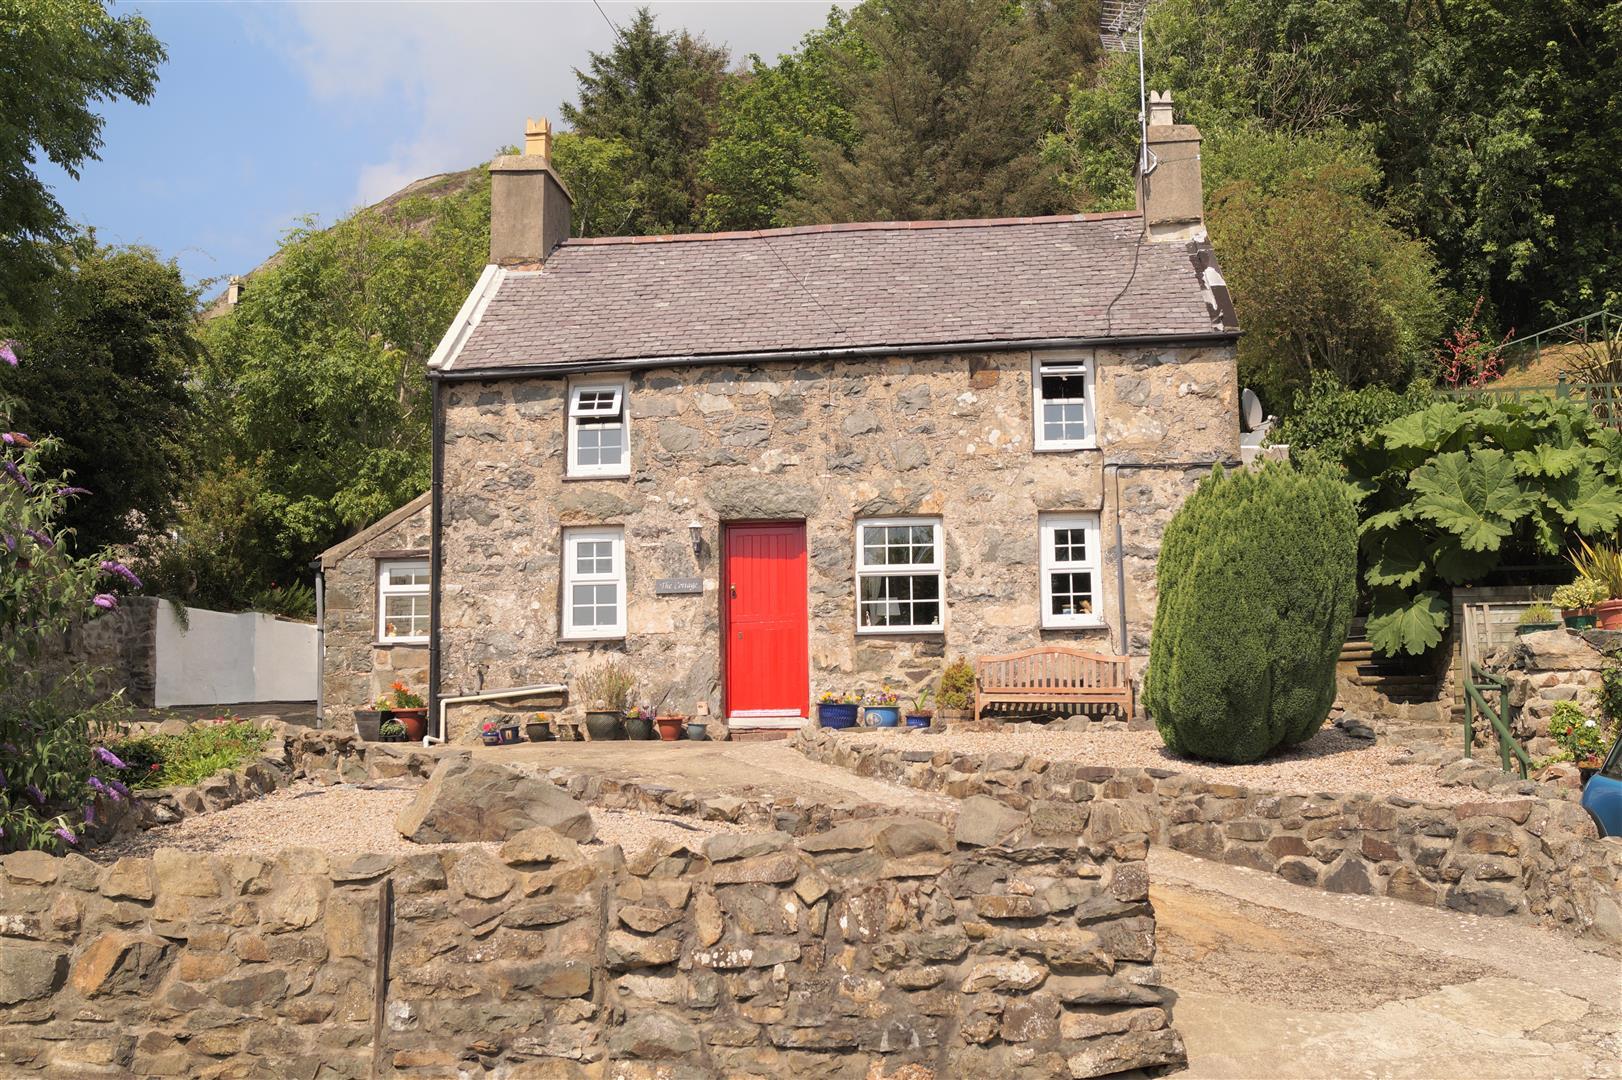 Boduan, Pwllheli - £249,950